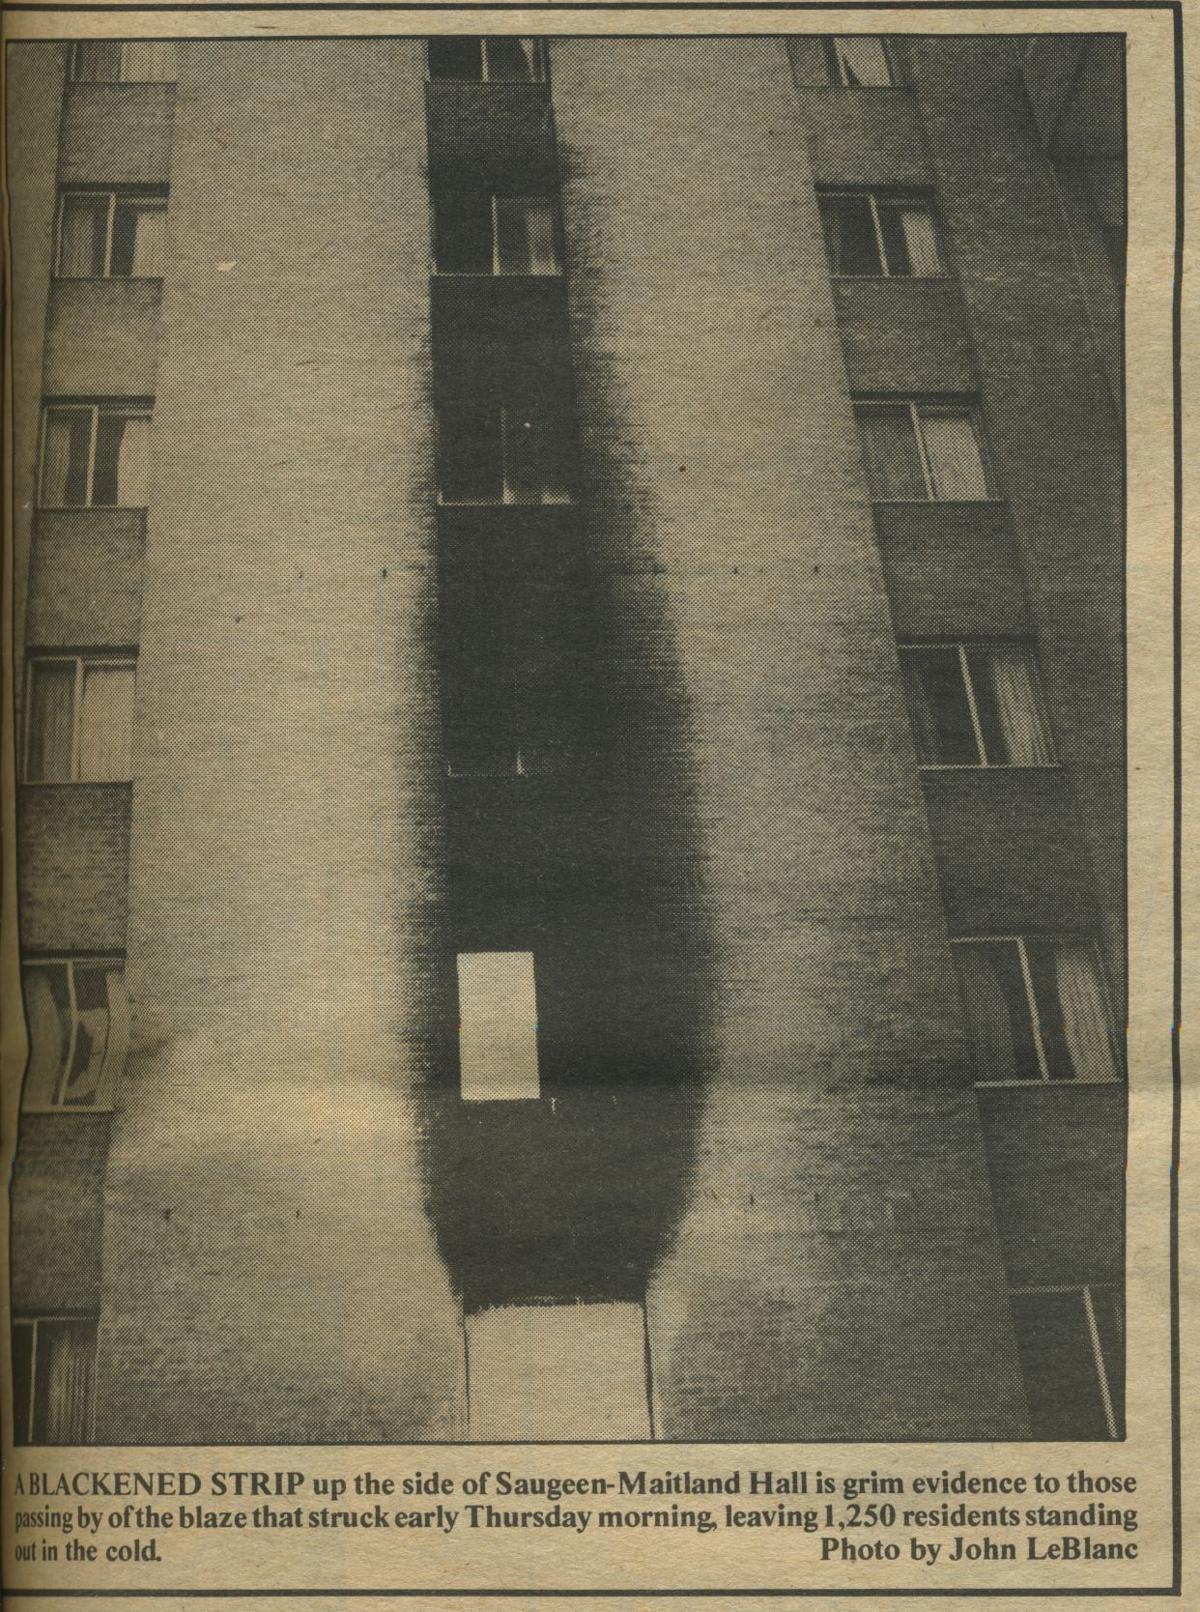 1984 Saugeen arson, outside